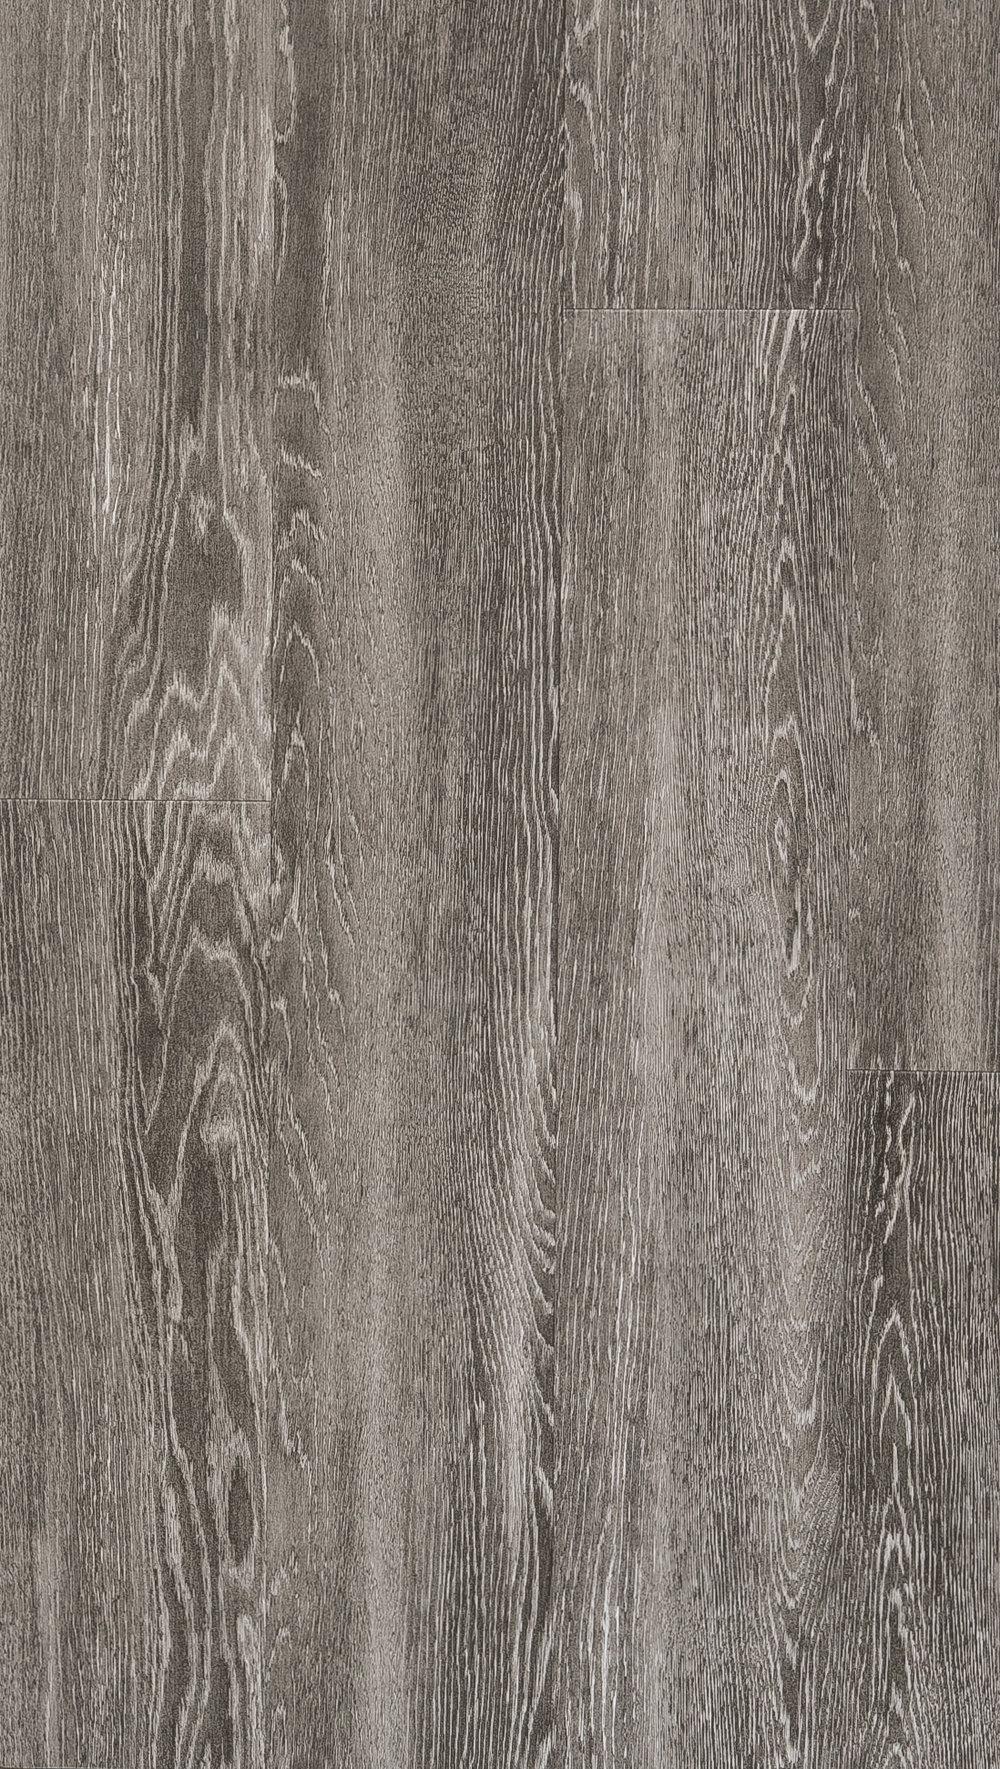 W5015 - Greystone Oak